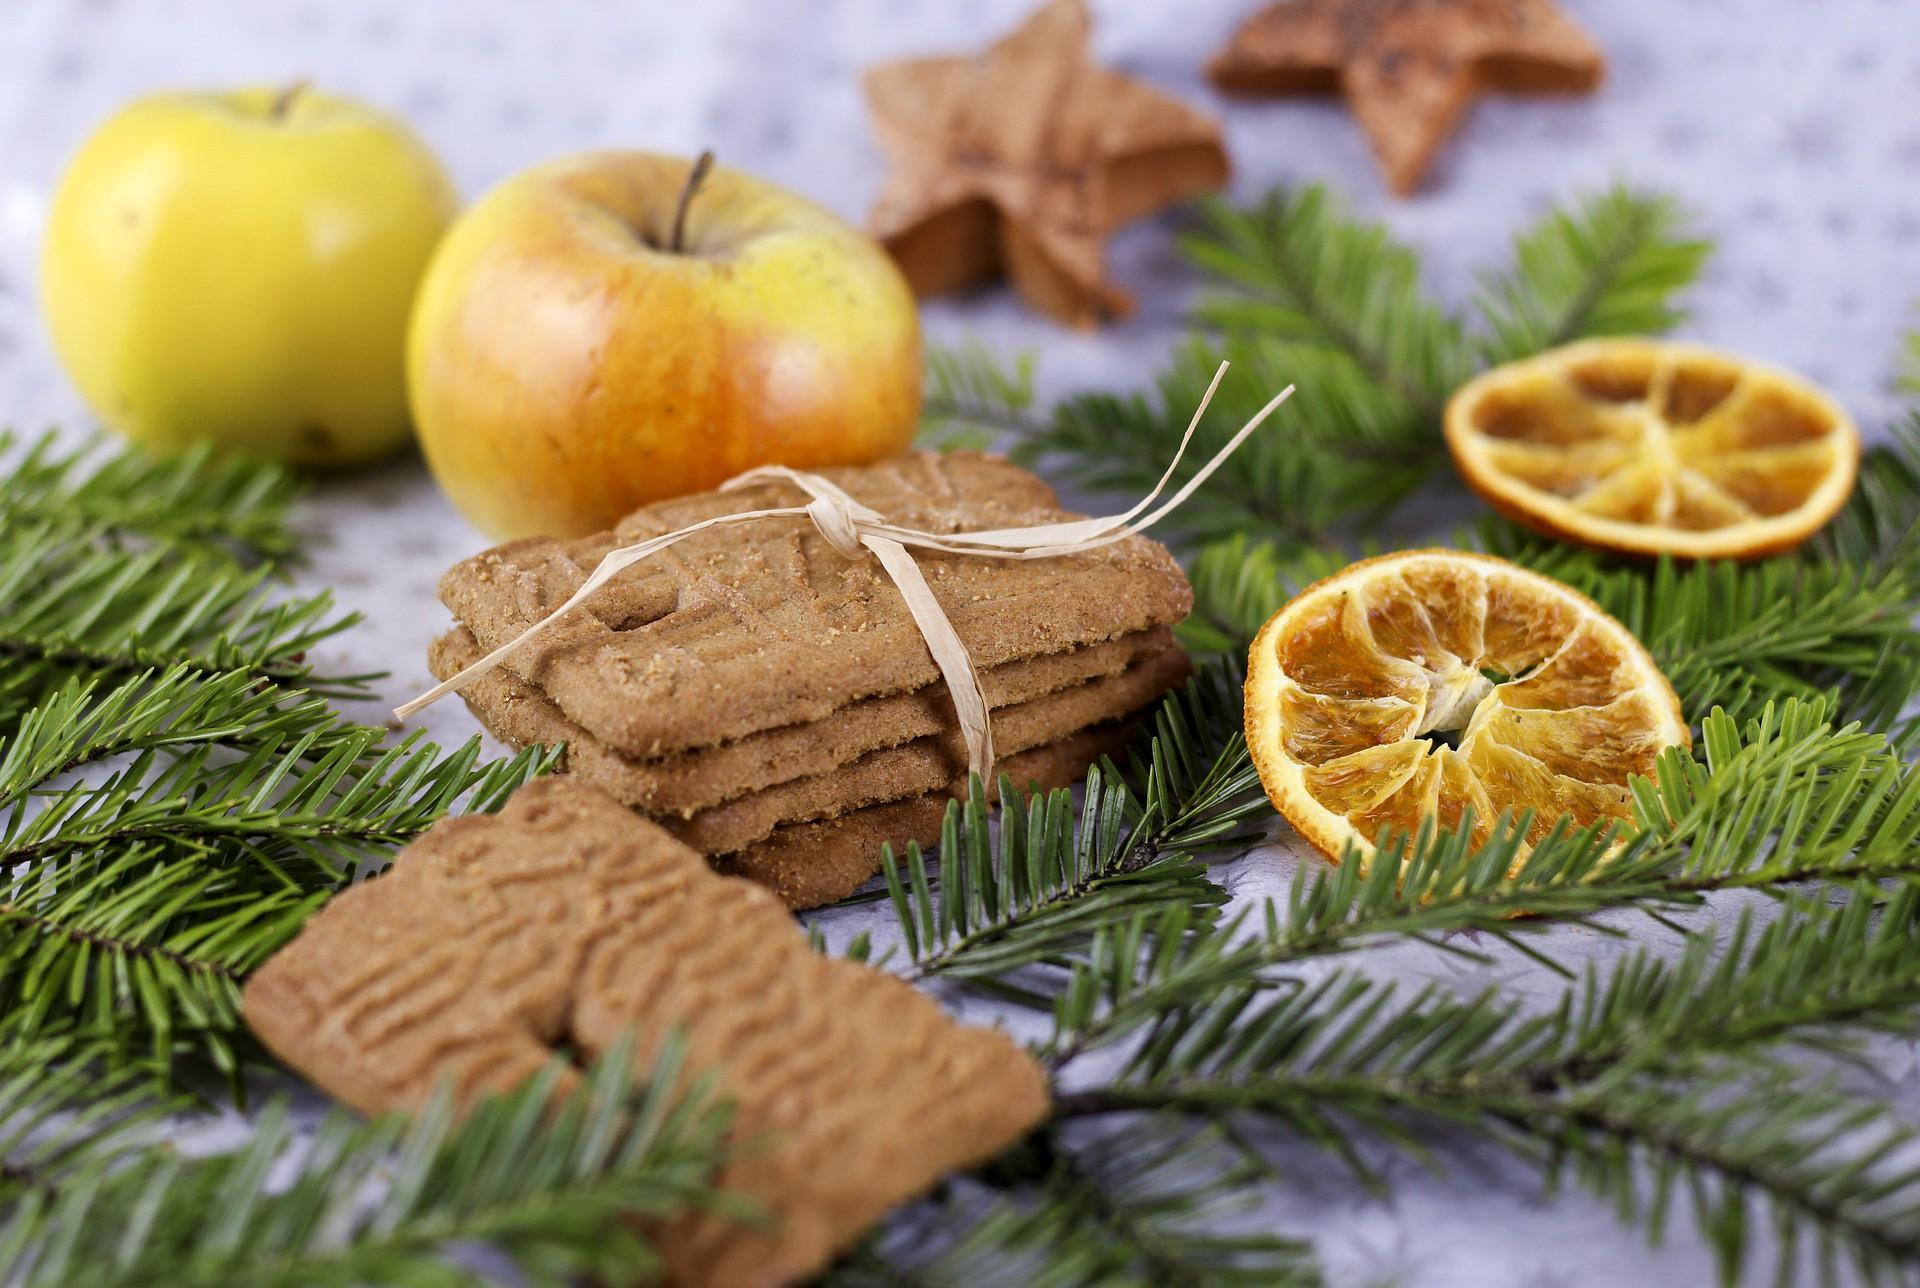 10 Lesser-Known Specialties To Enjoy In Belguim